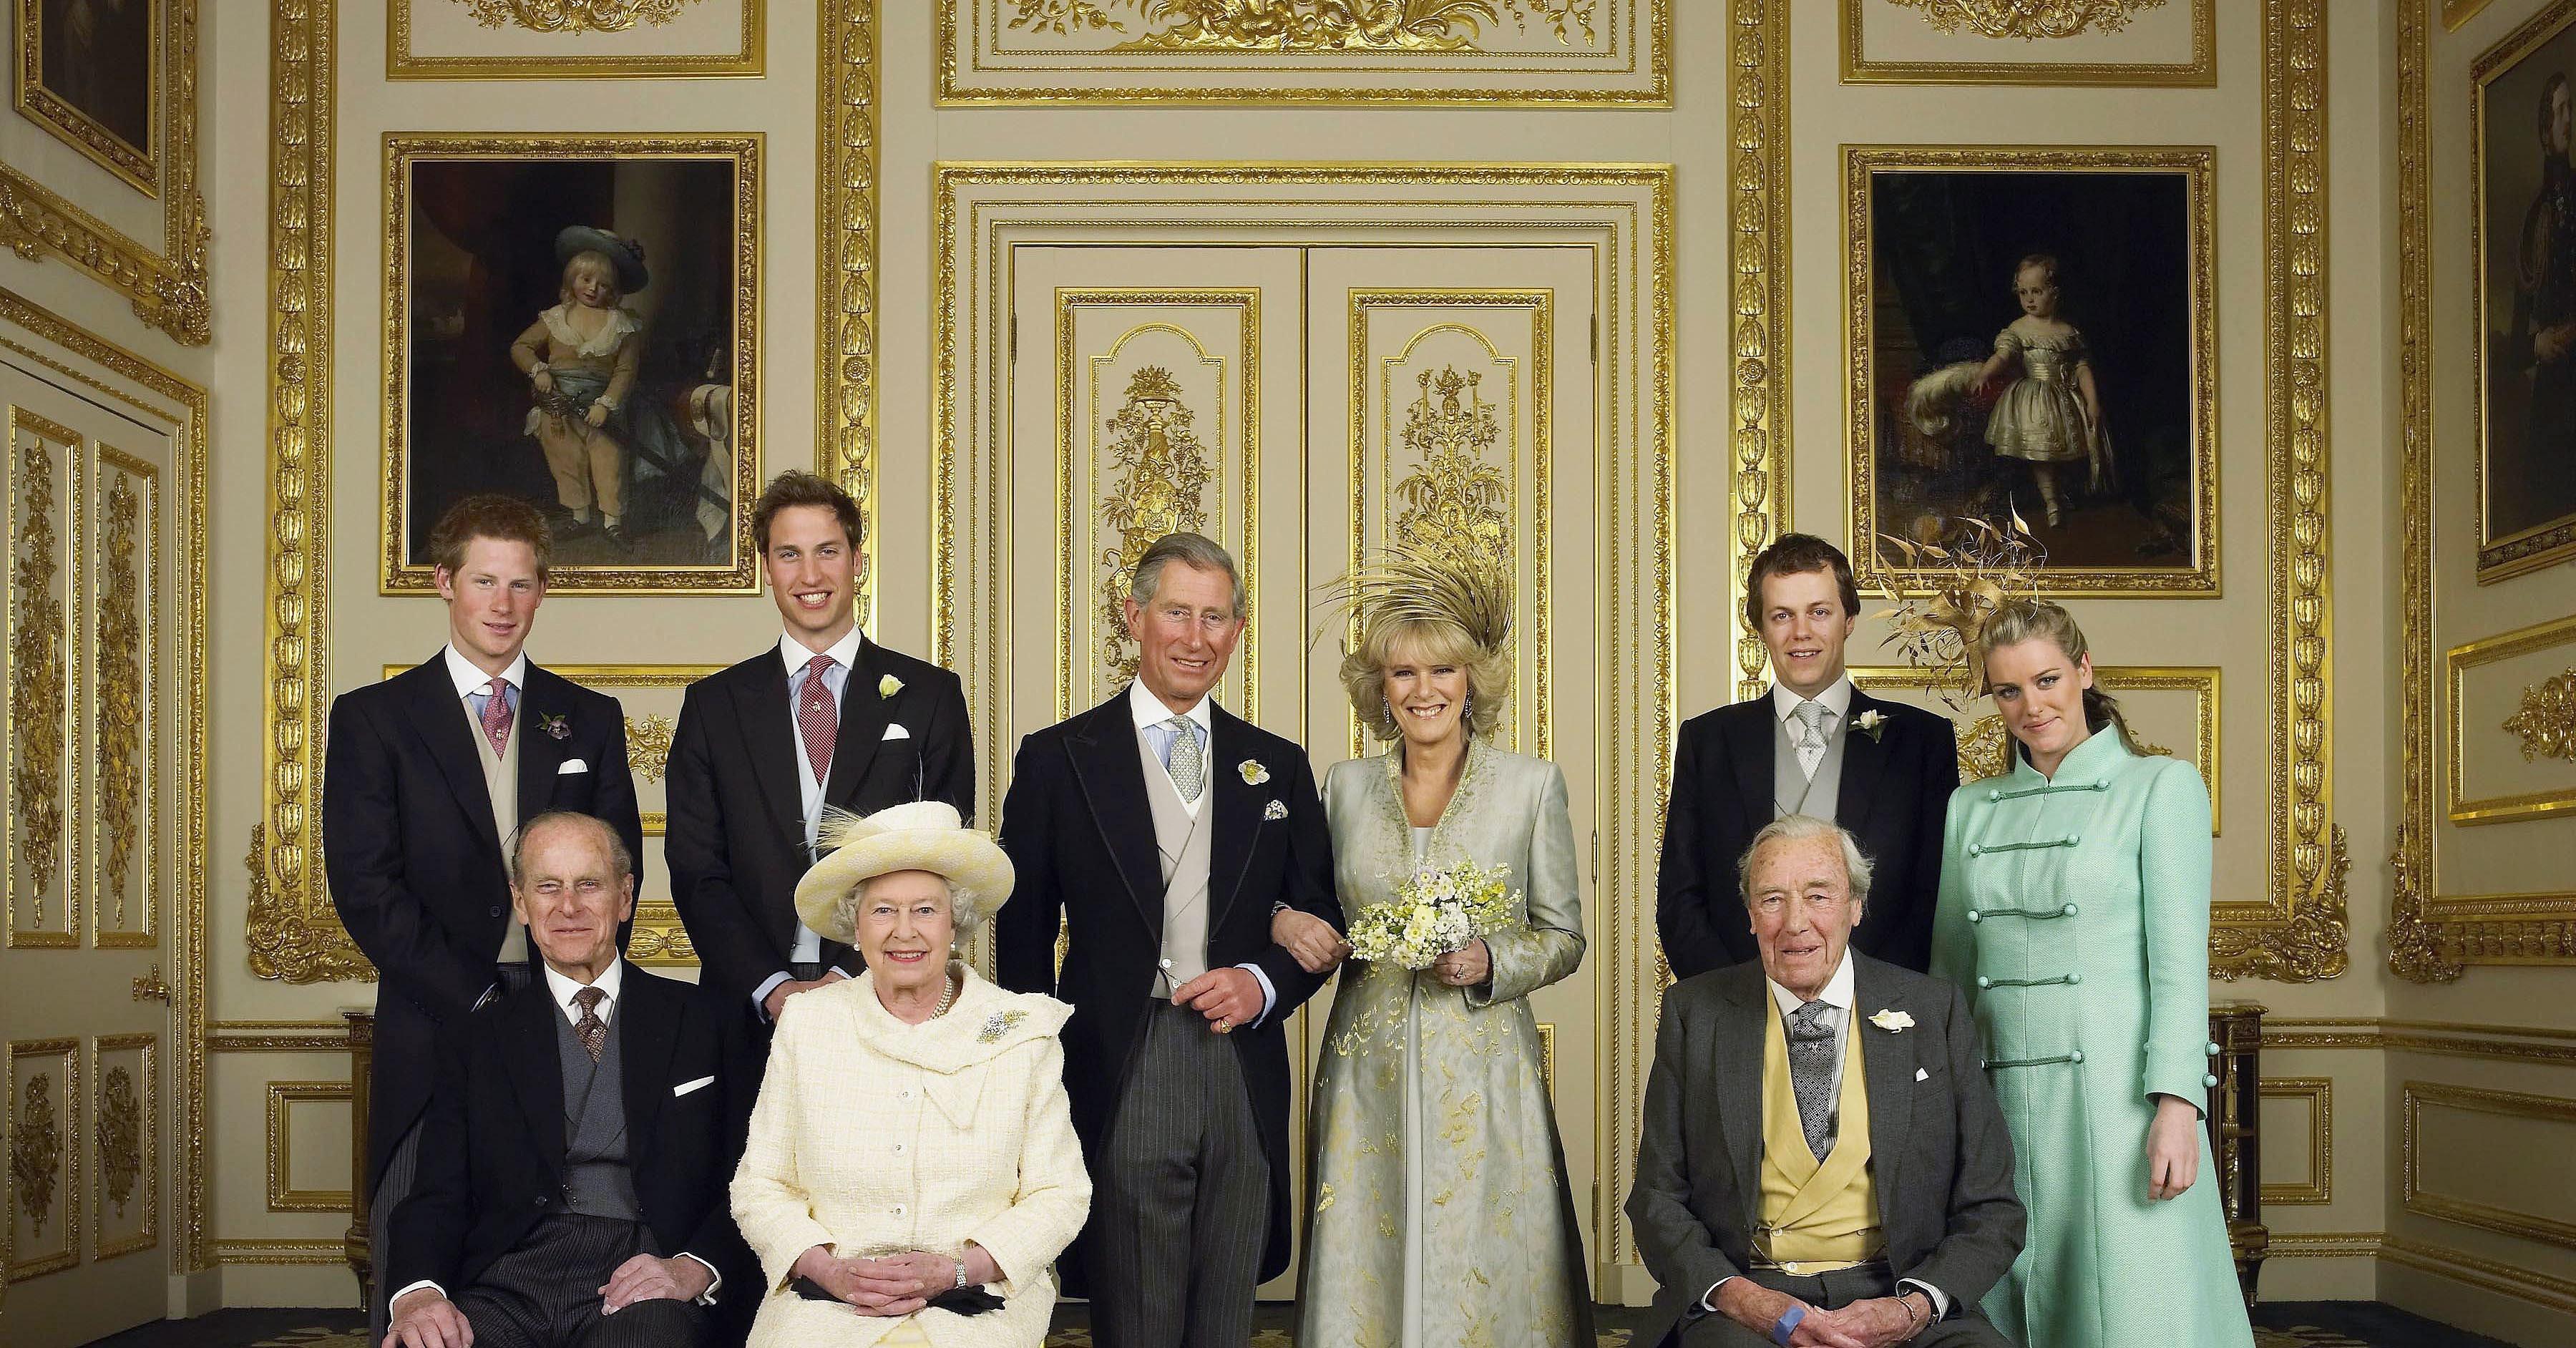 Prince-Charles-Camilla-Parker-Bowles-Bride-Camilla-Parker.jpg